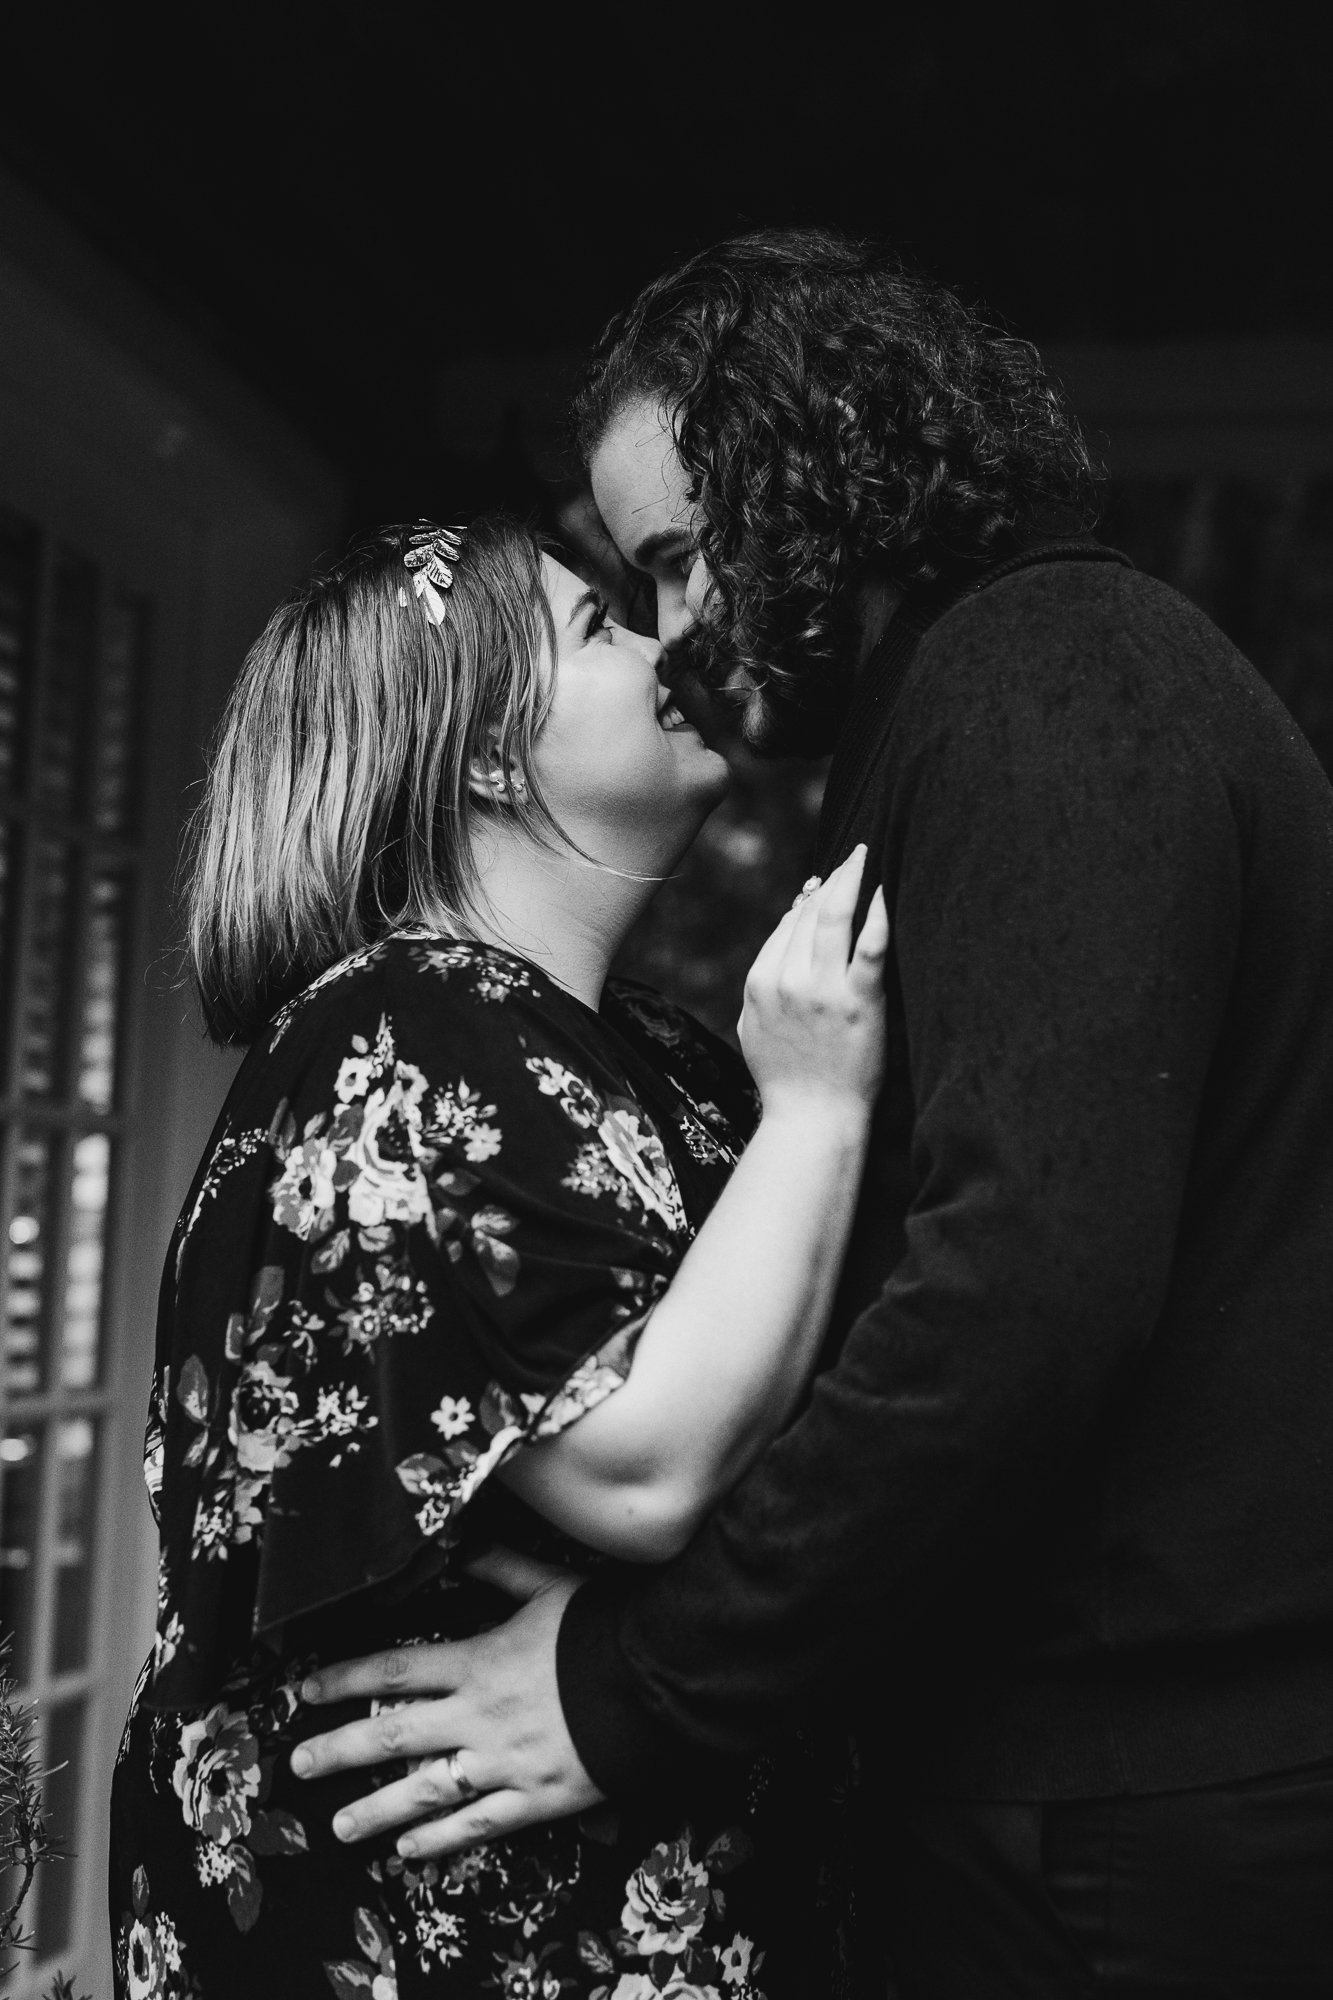 Victoria Bc Couples Boudoir Photography-7.jpg